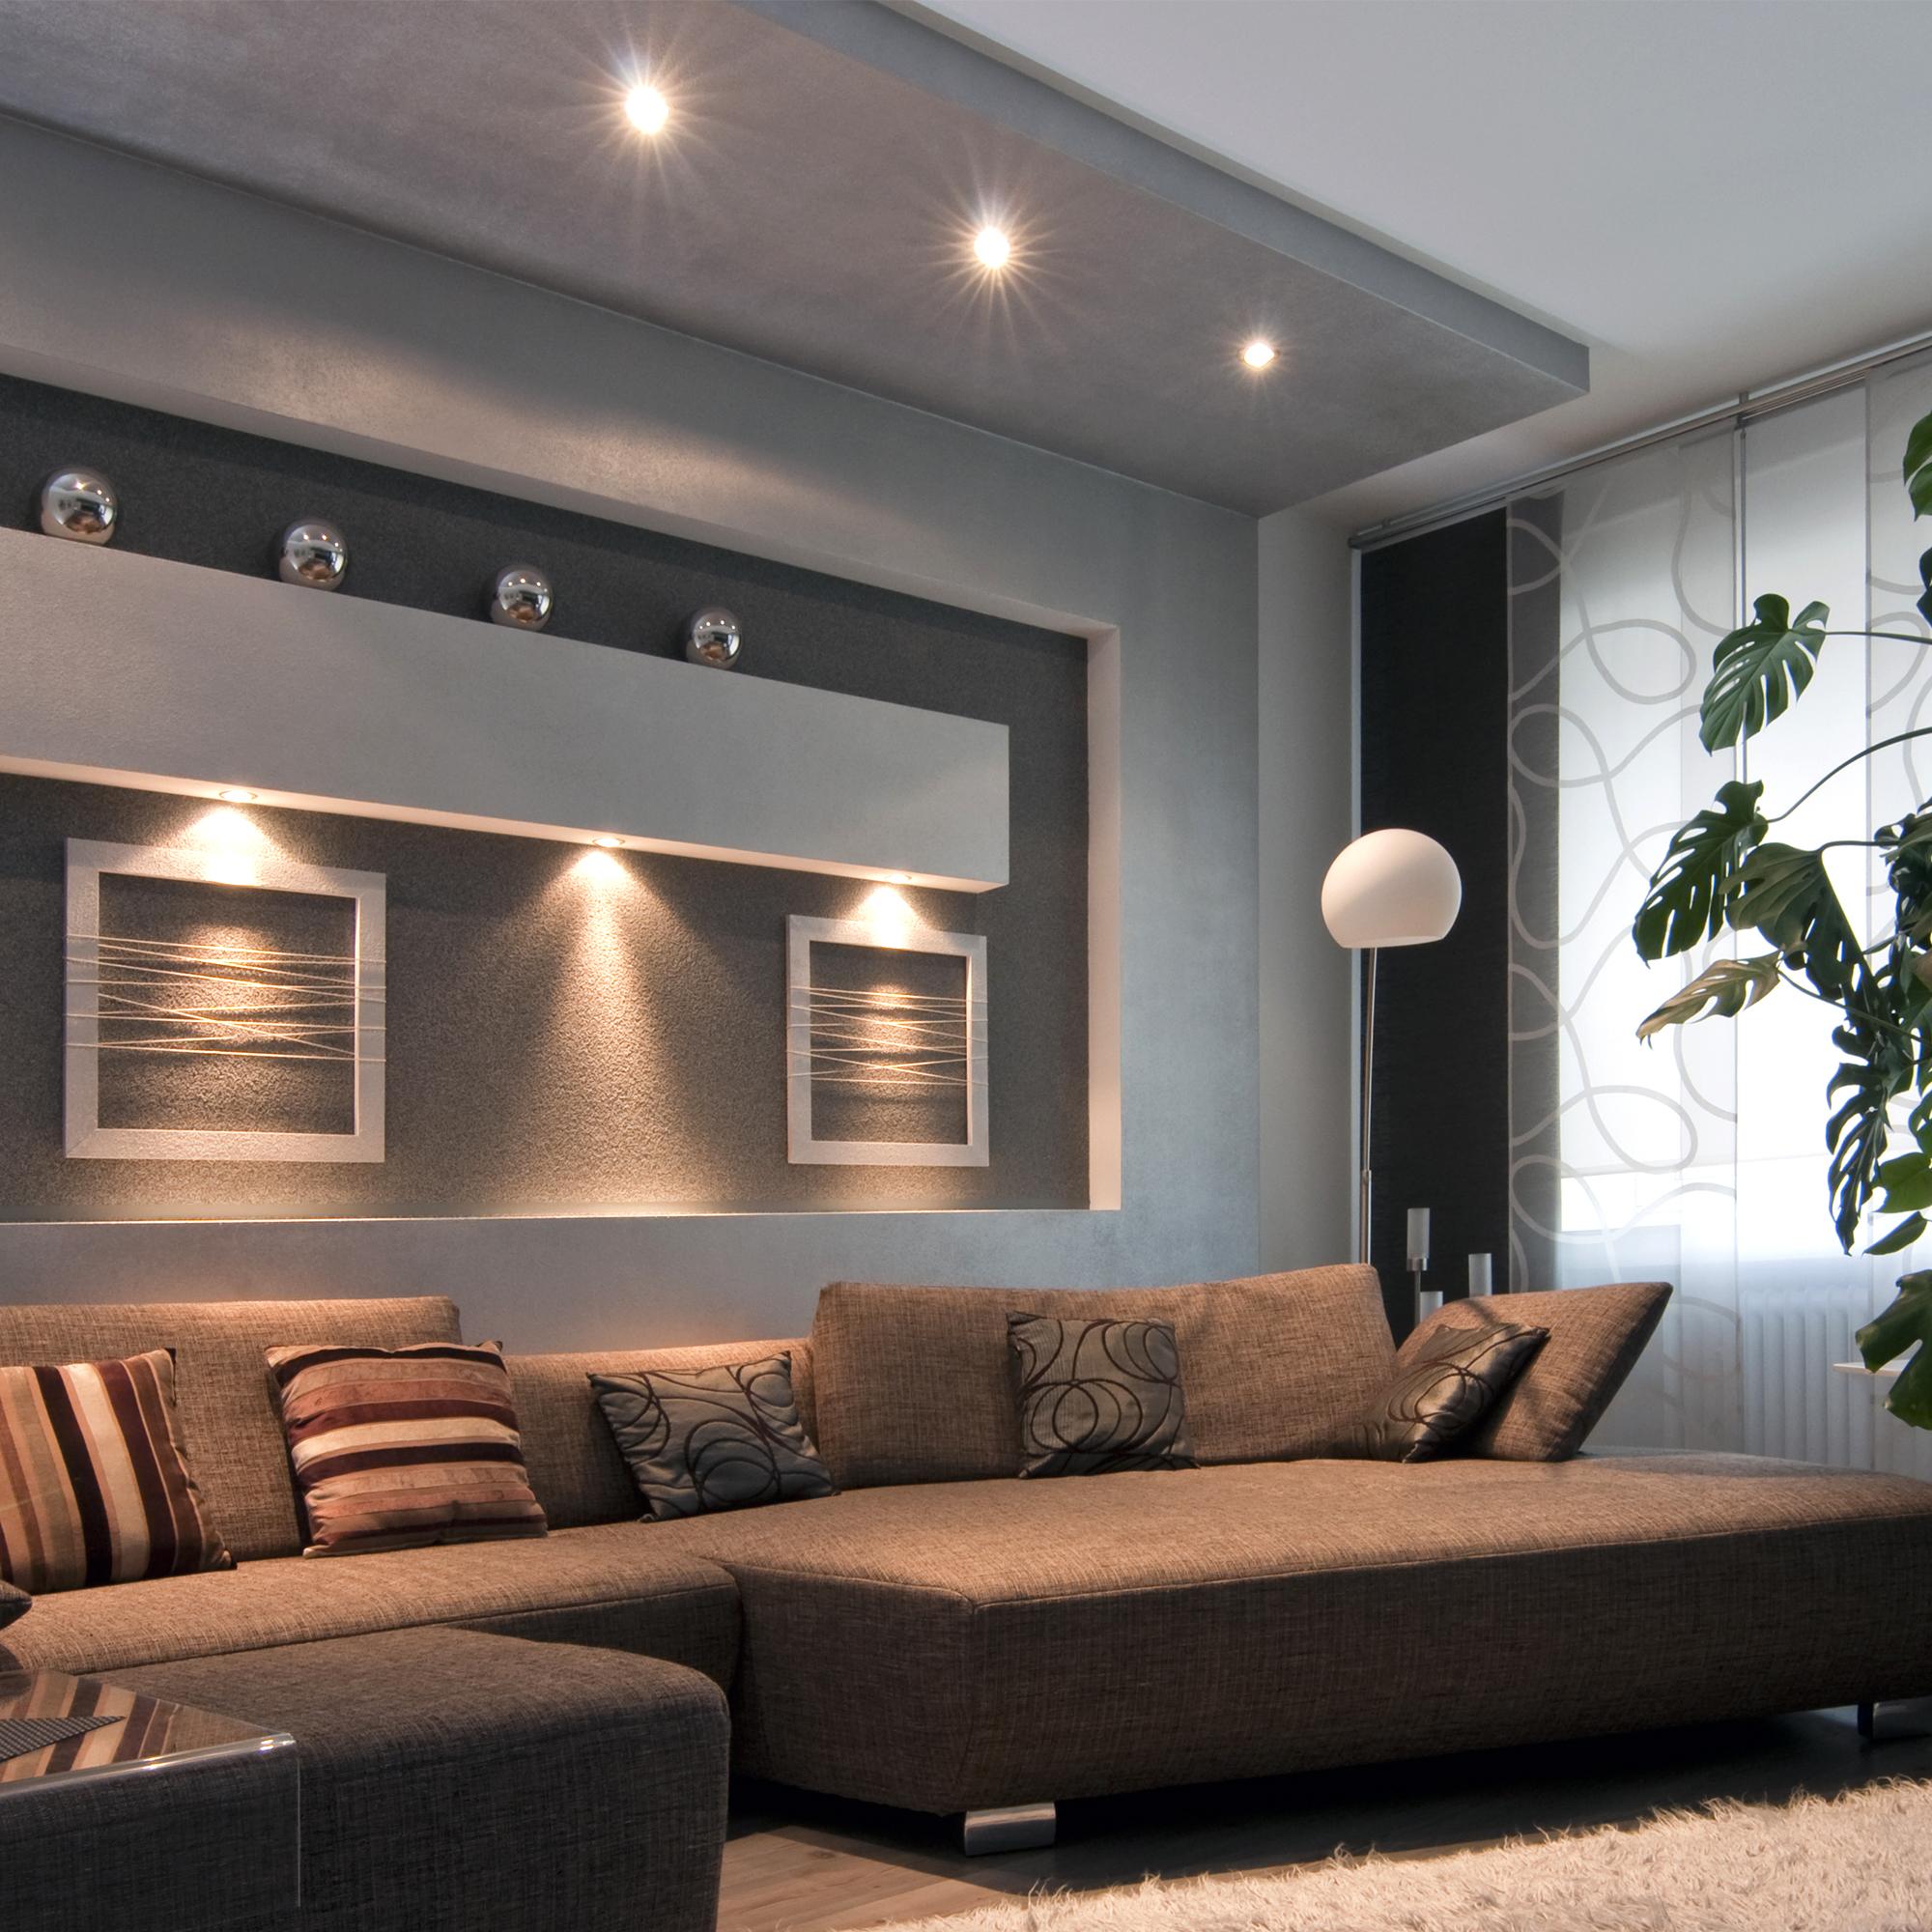 10er Set LED Einbau Spots dimmbar Decken Flur Leuchten weiß